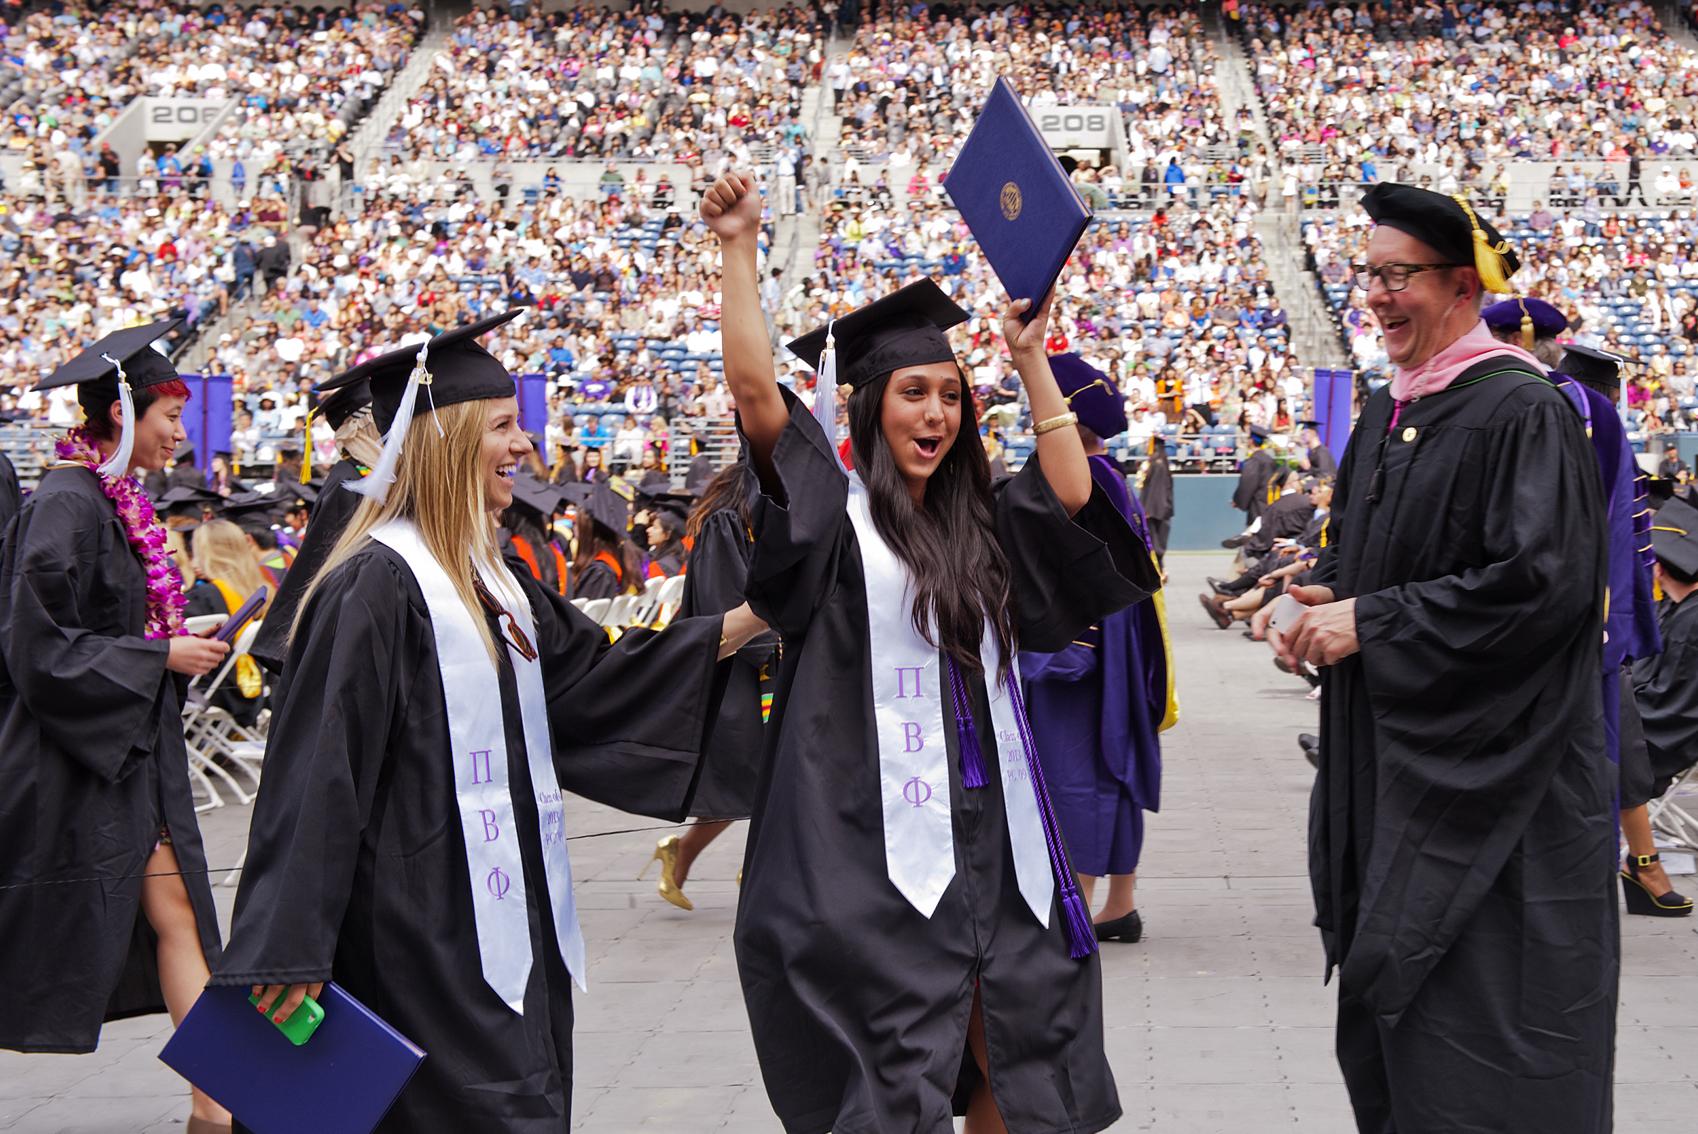 139th commencement for UW's Seattle campus at Husky Stadium June 14 | UW  News